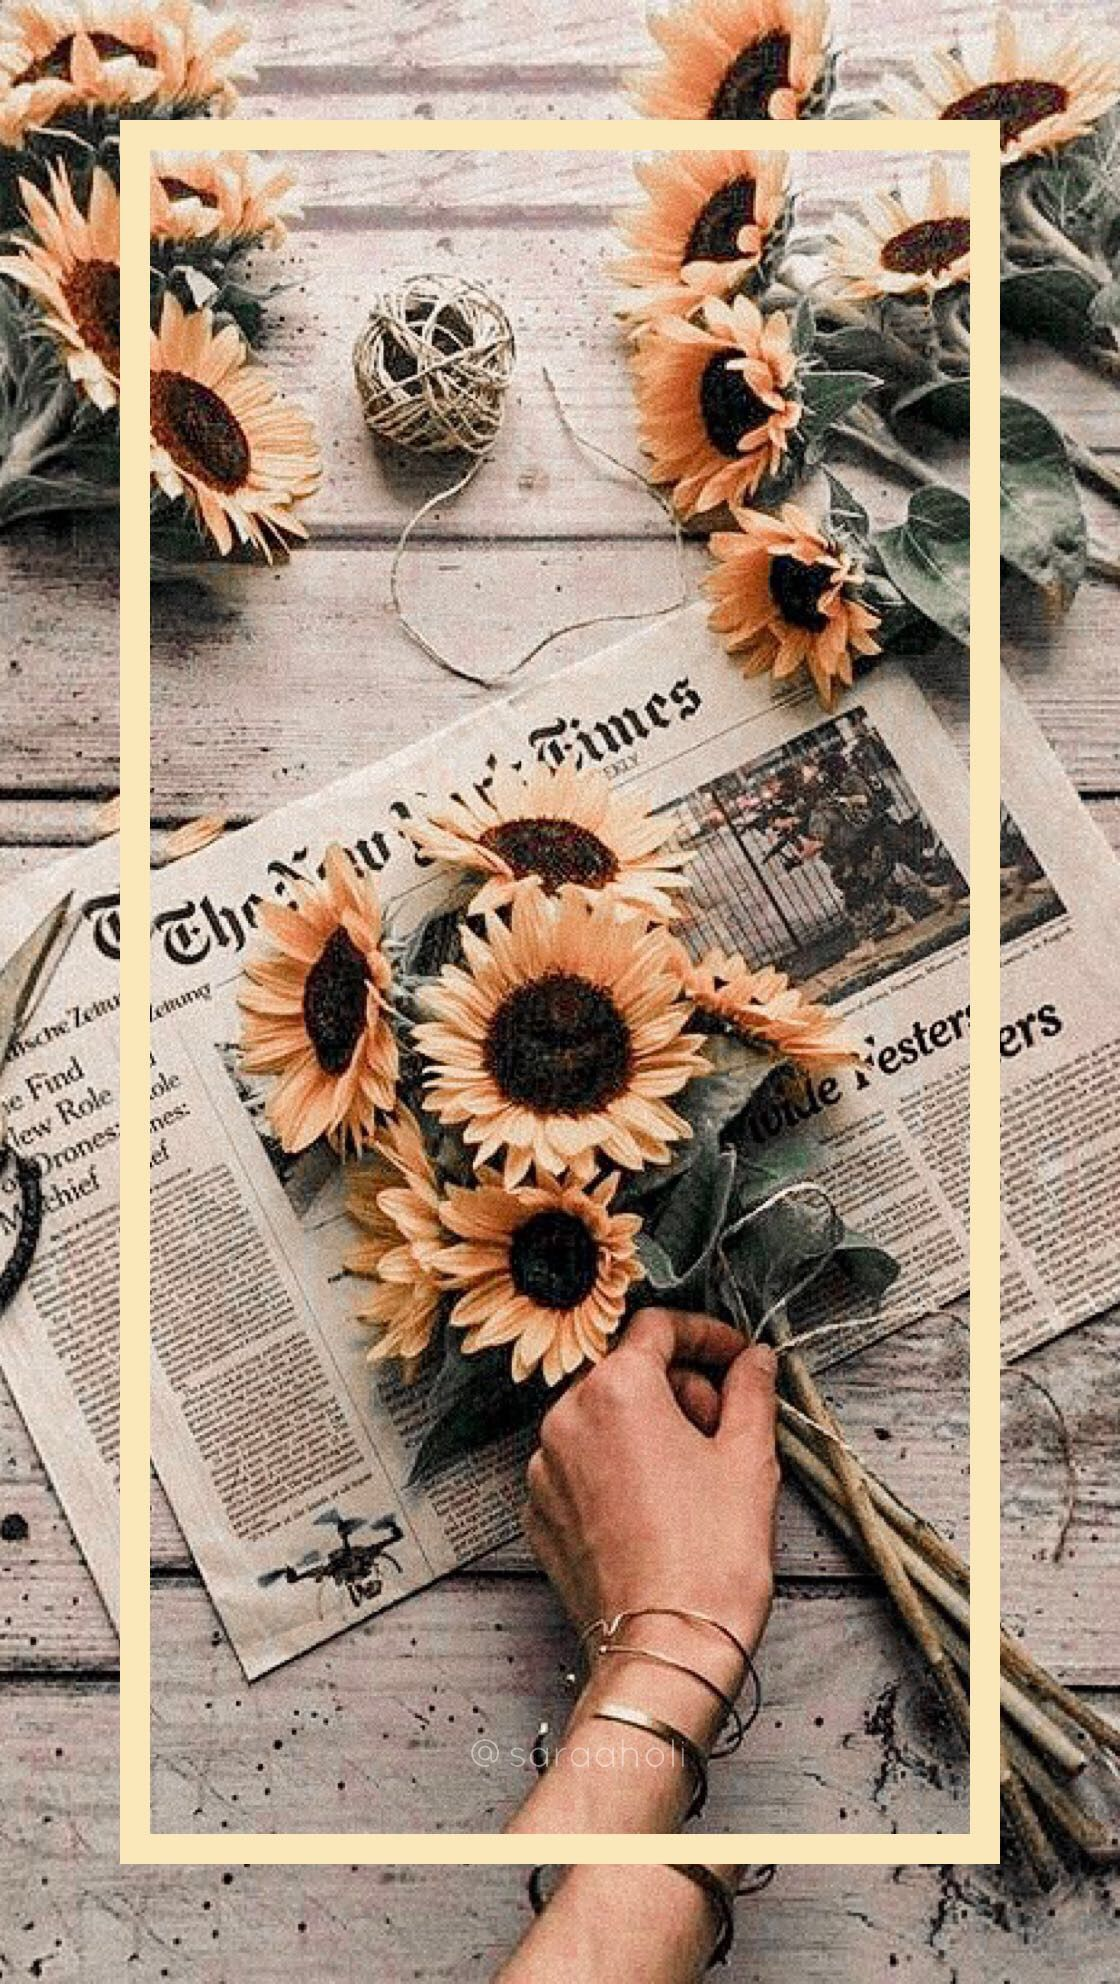 iPhone wallpaper #sunflowers #wallpaper #newspaper #iphone